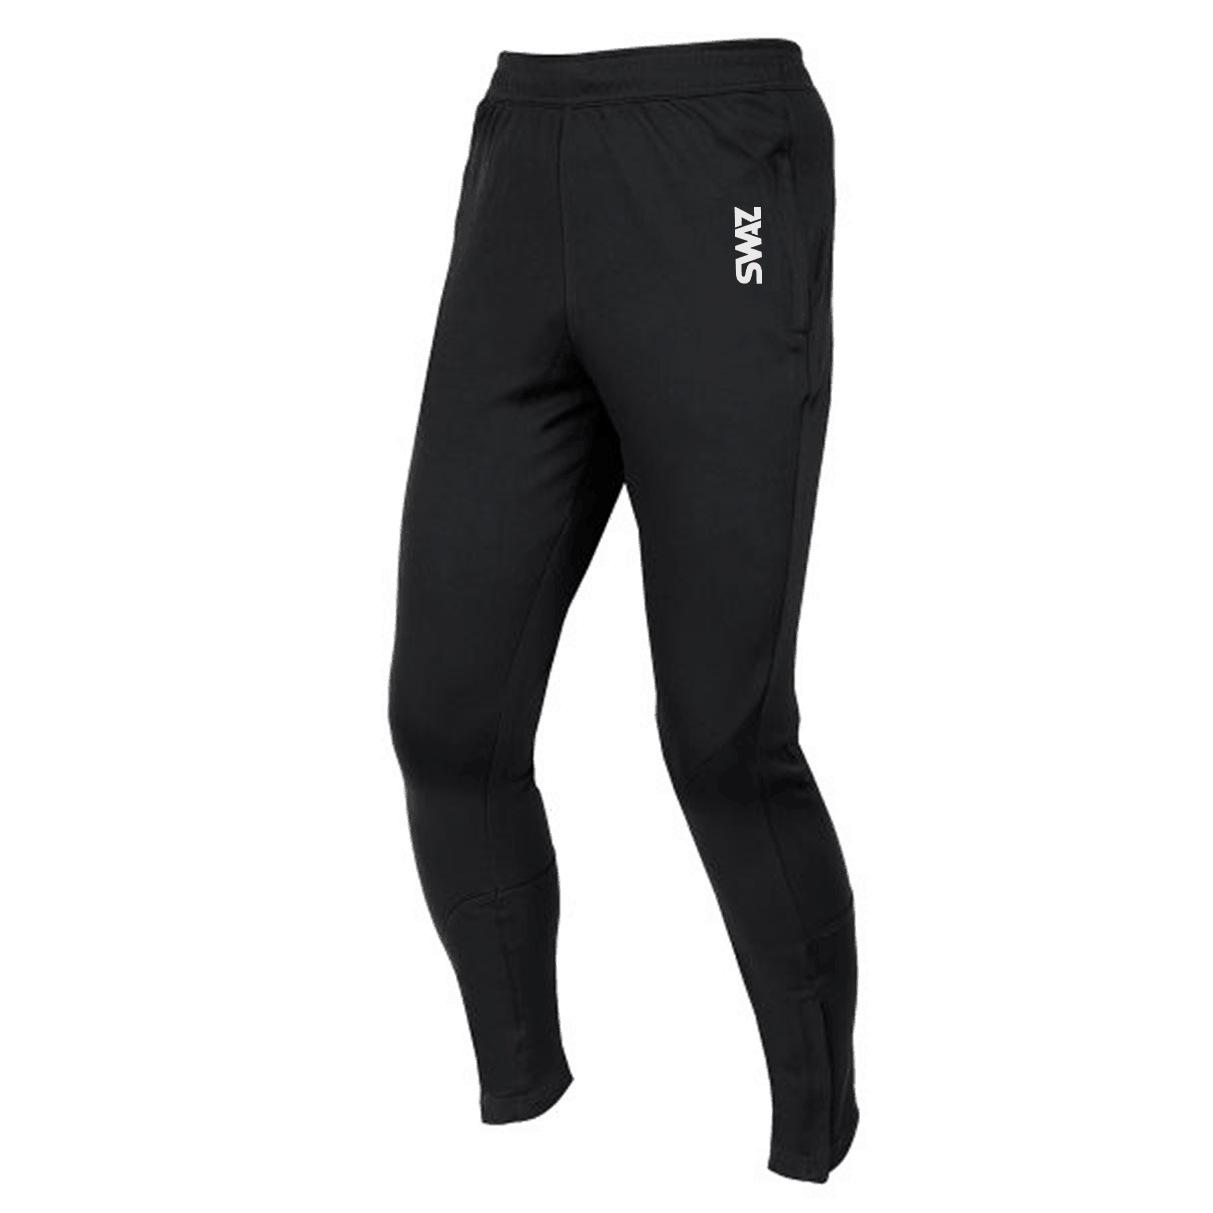 SWAZ Black Skinny Pants | Football Teamwear